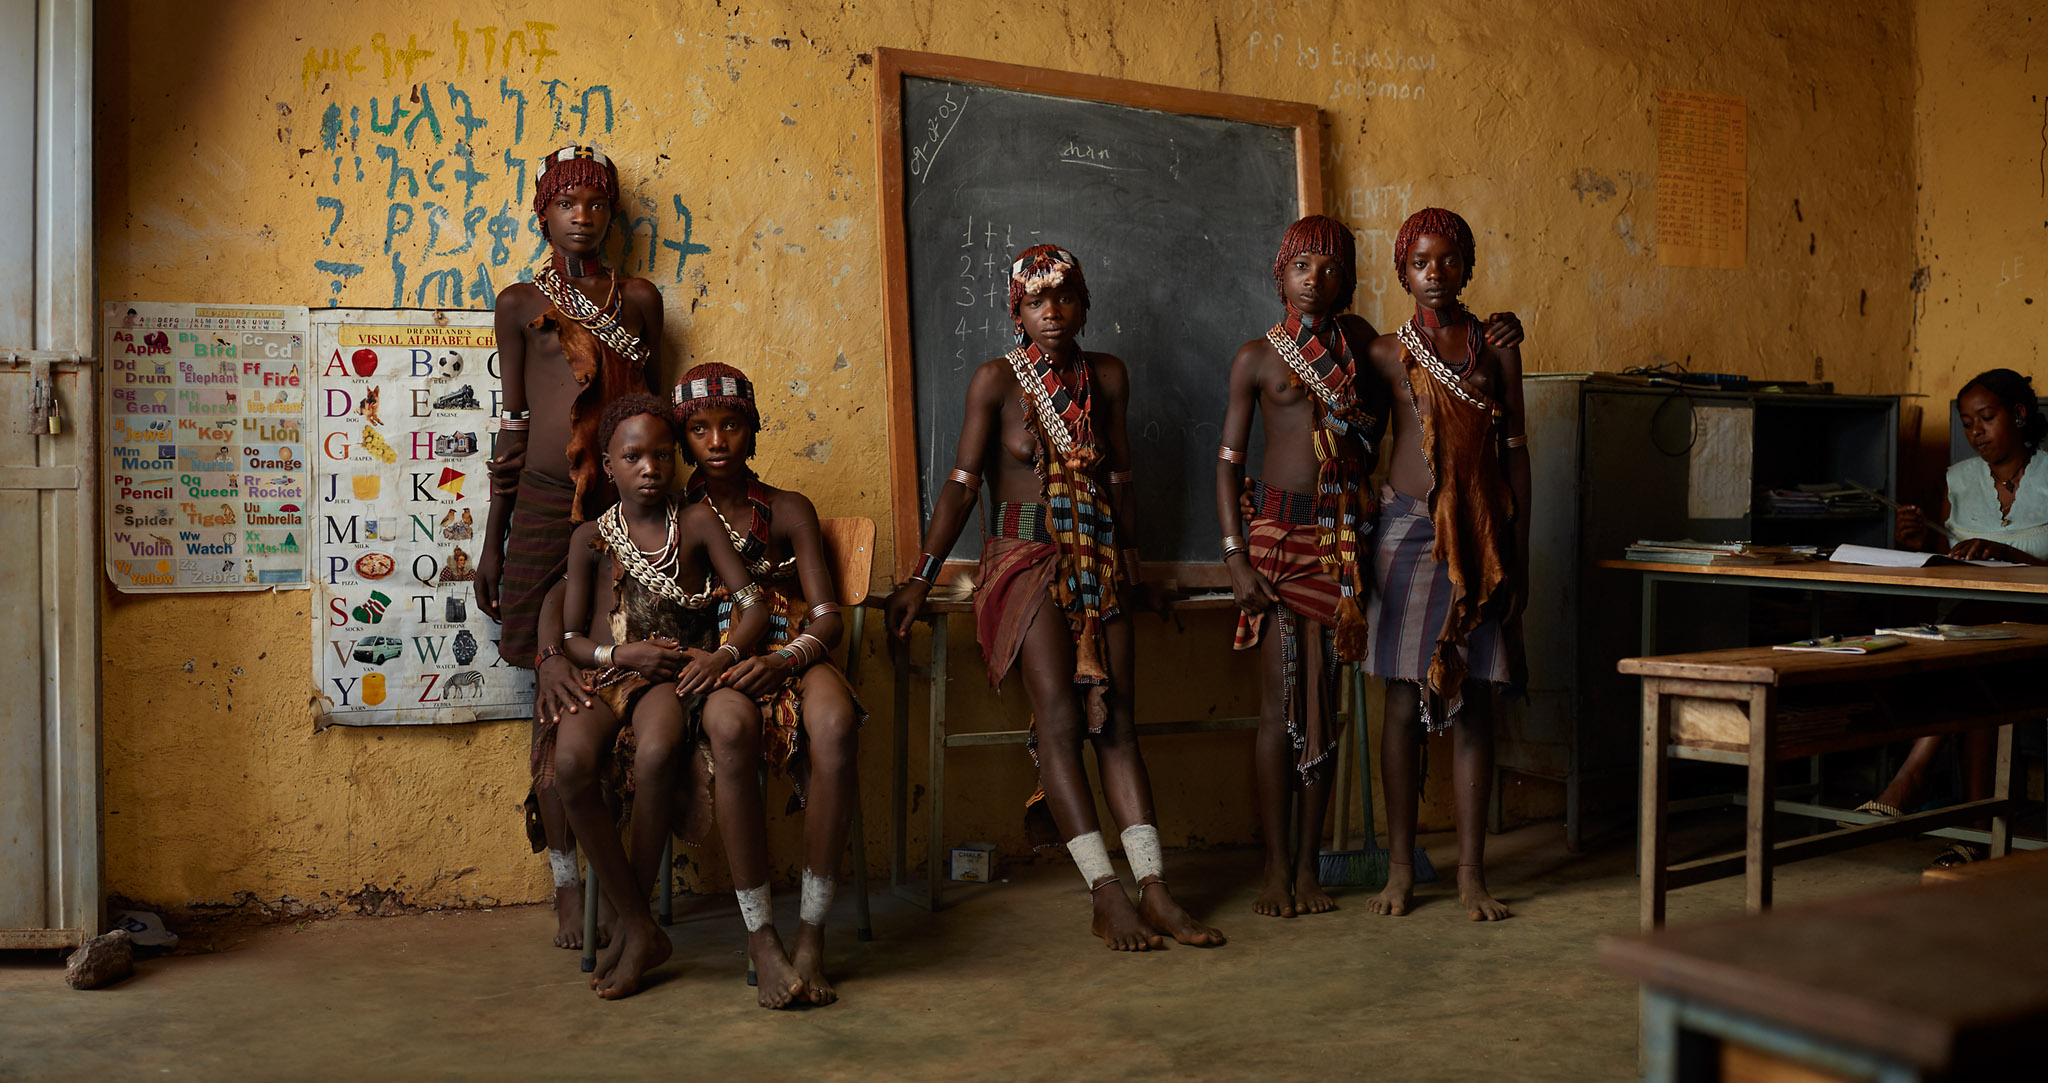 Present and future students: Guti Kuli, Asi Kala, Wollyso Muga, Keli Kyma, Ente Algo and Kunki Dula. Hamar Tribe.